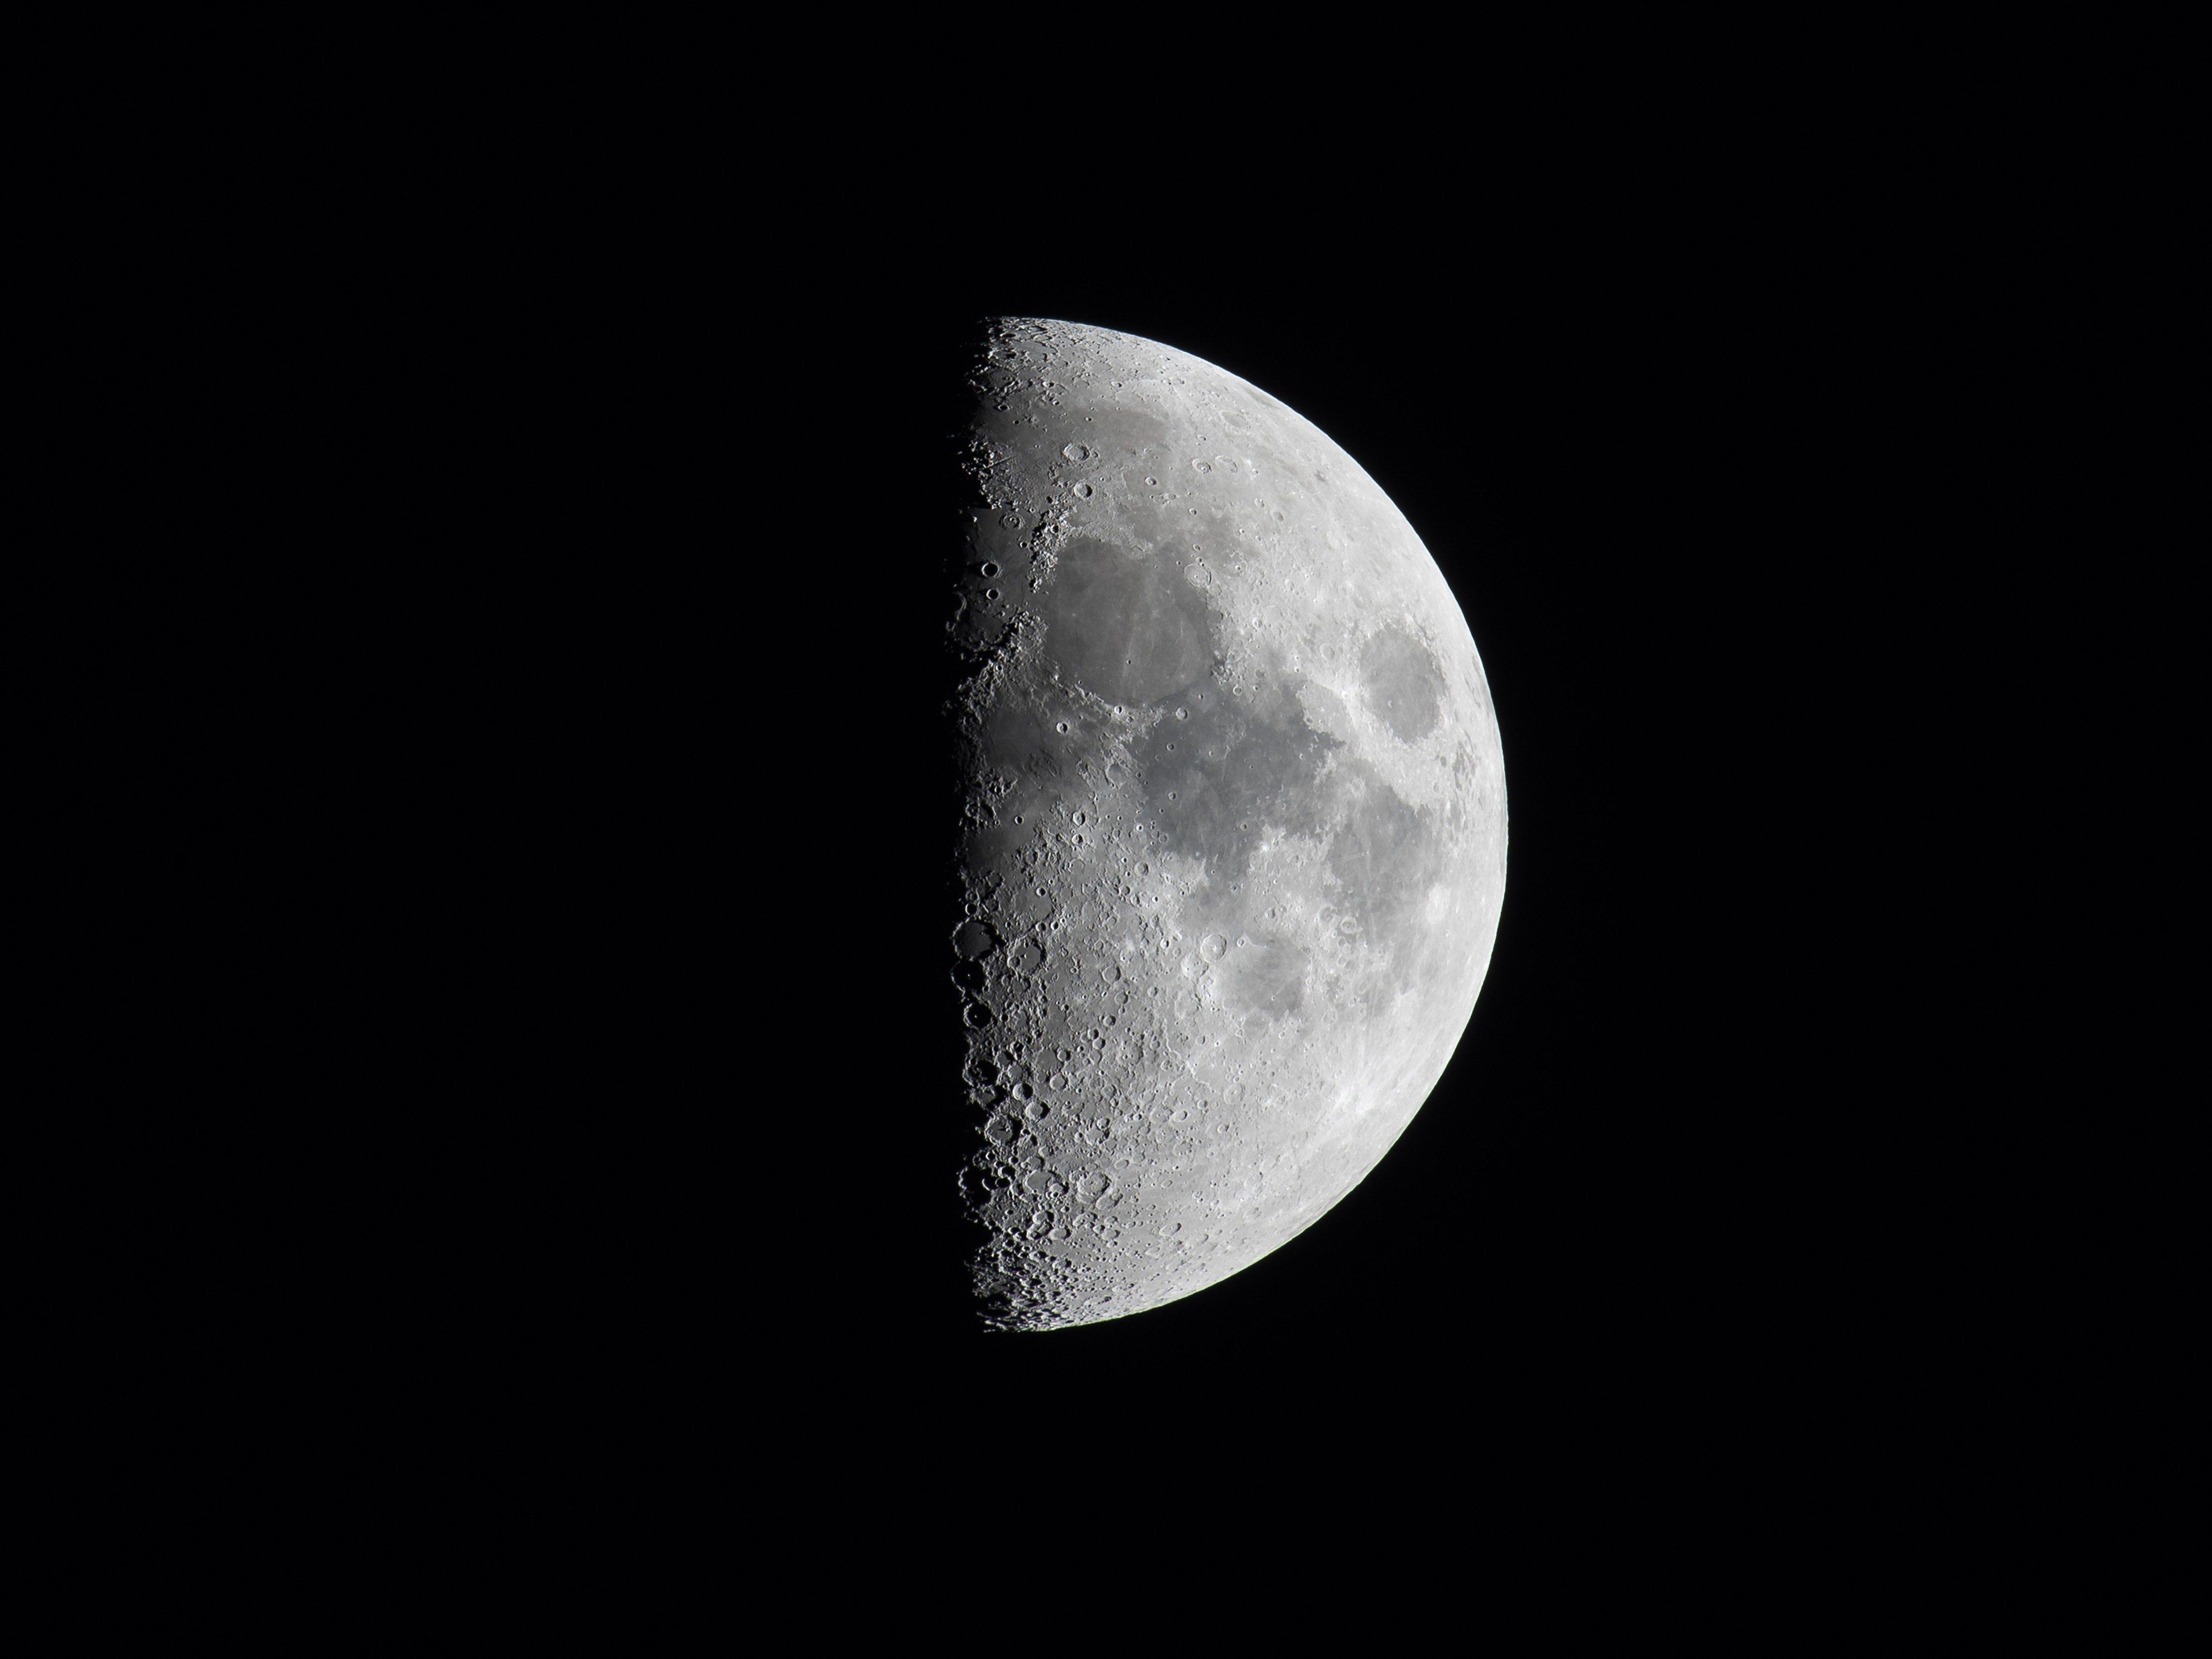 Best Reader's Digest jokes of all time - half moon